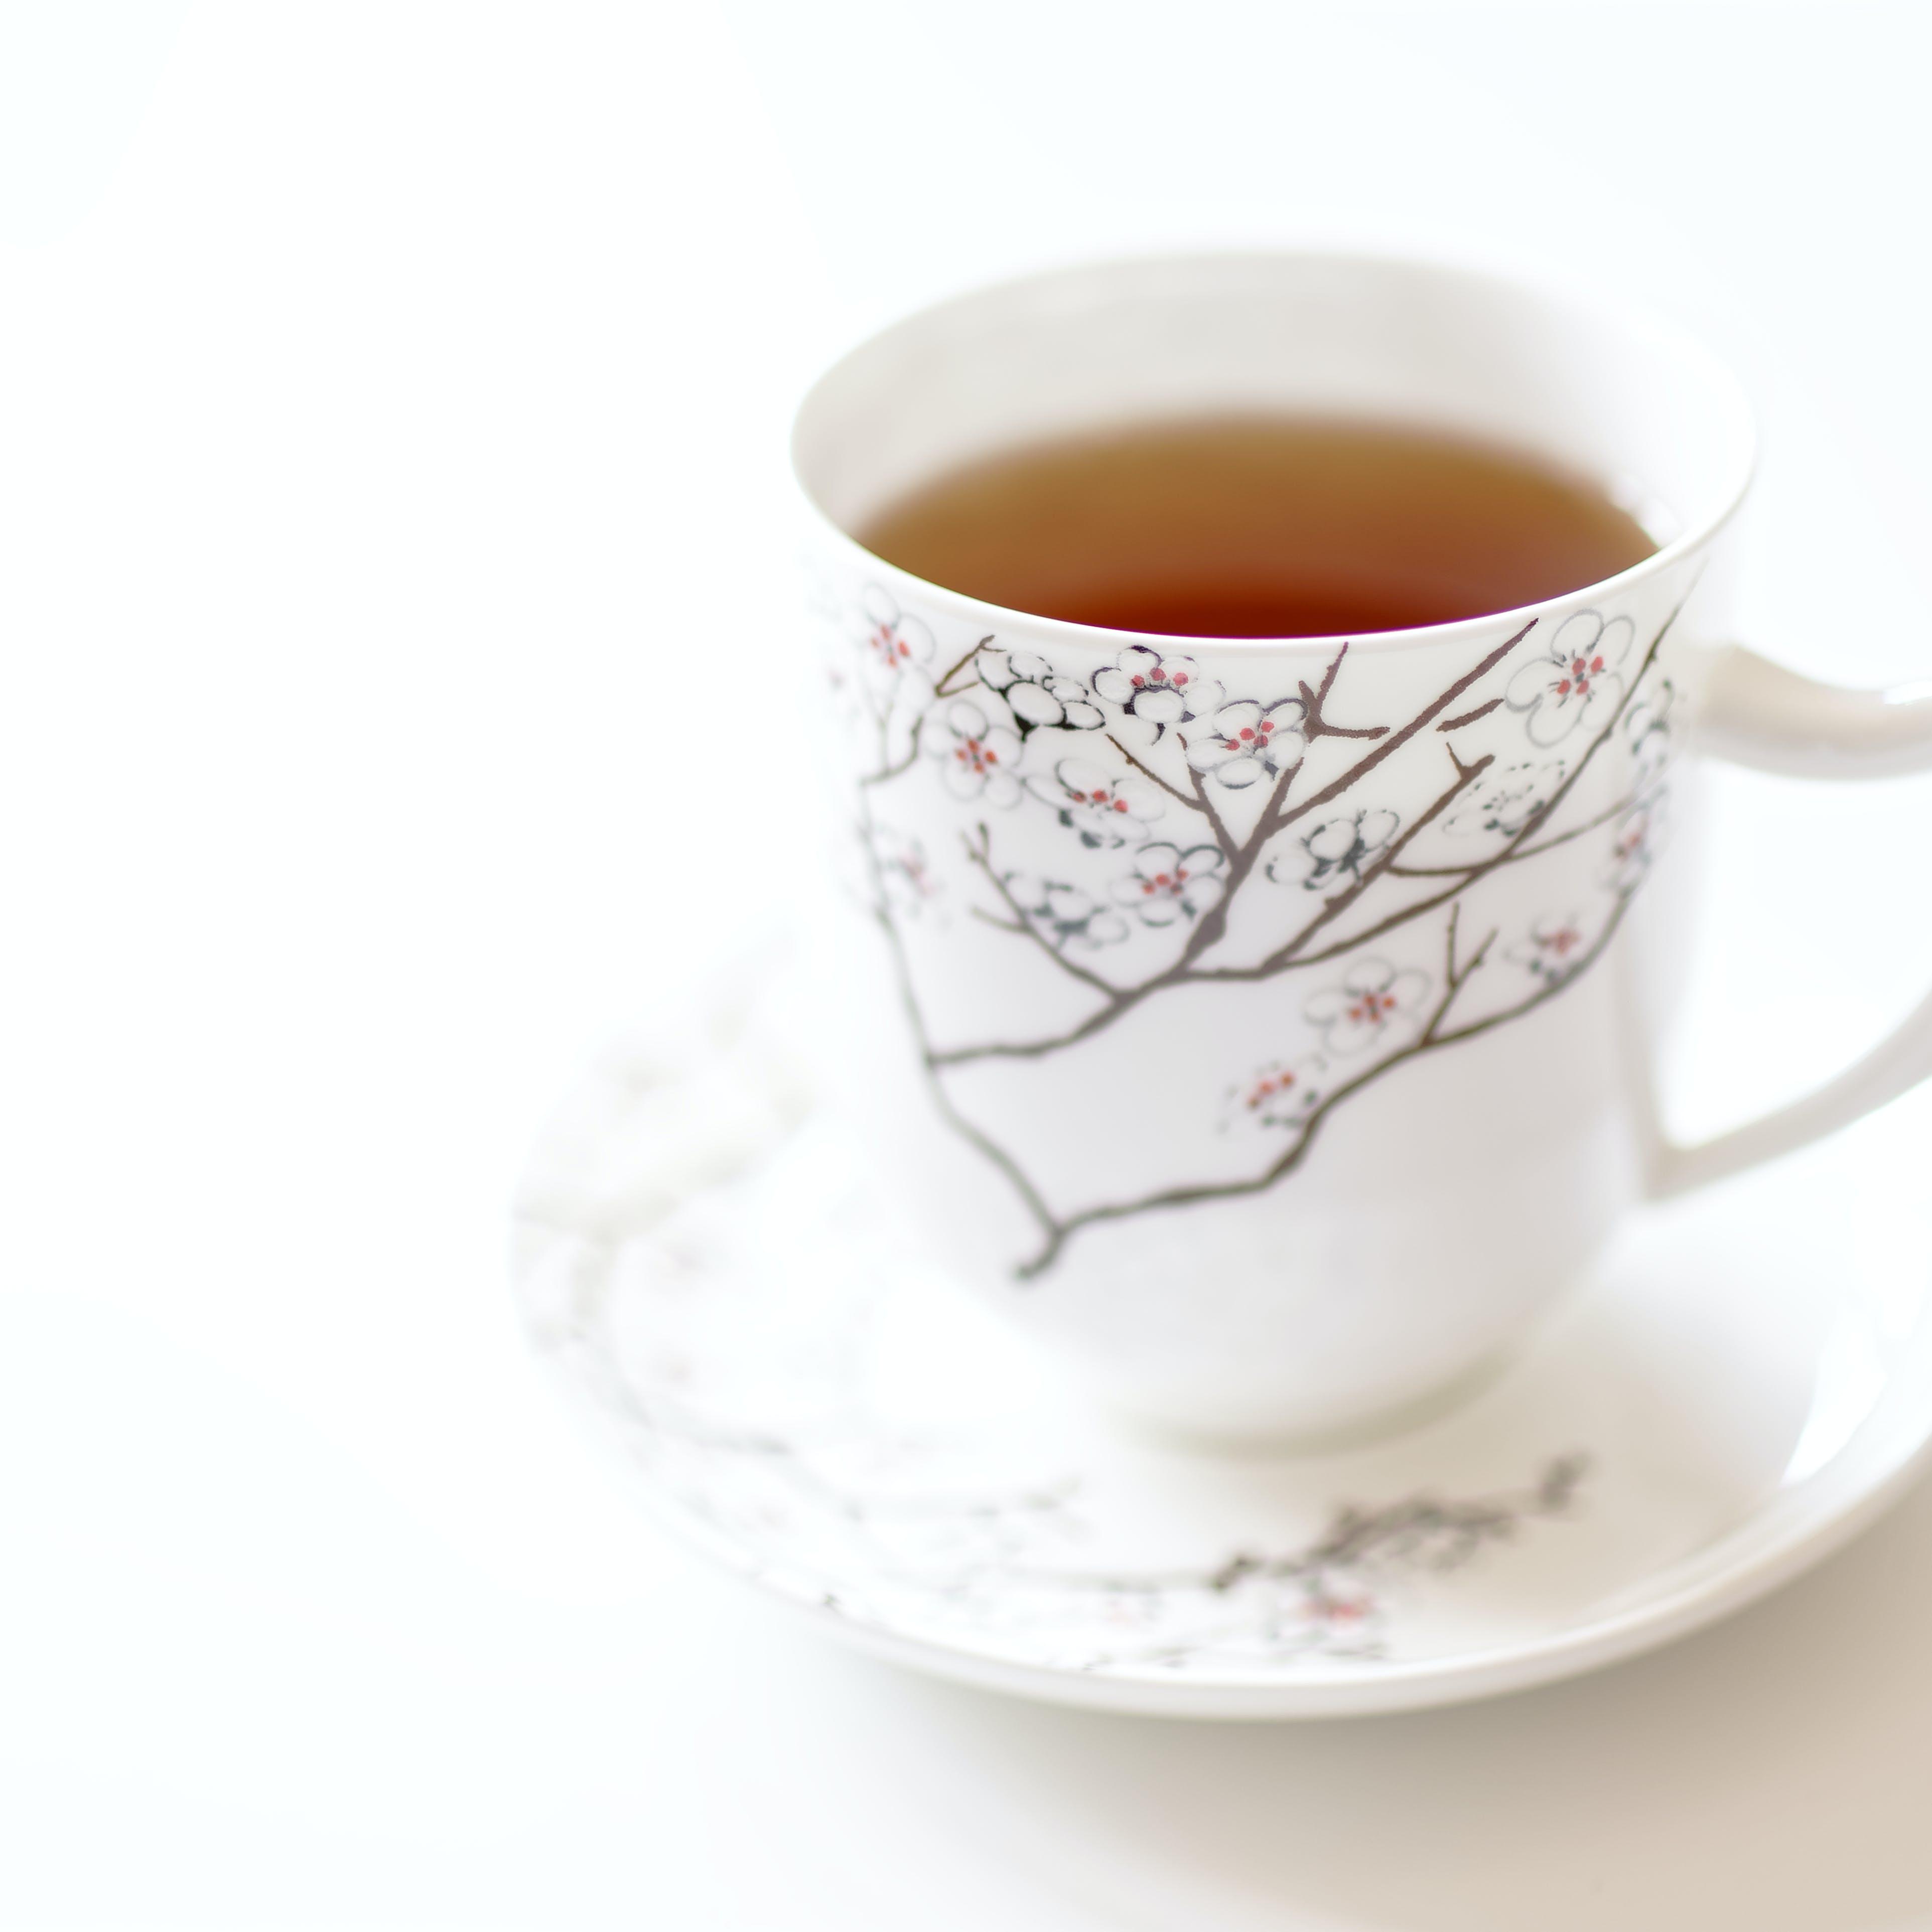 Free stock photo of drink, floral, highkey, mug